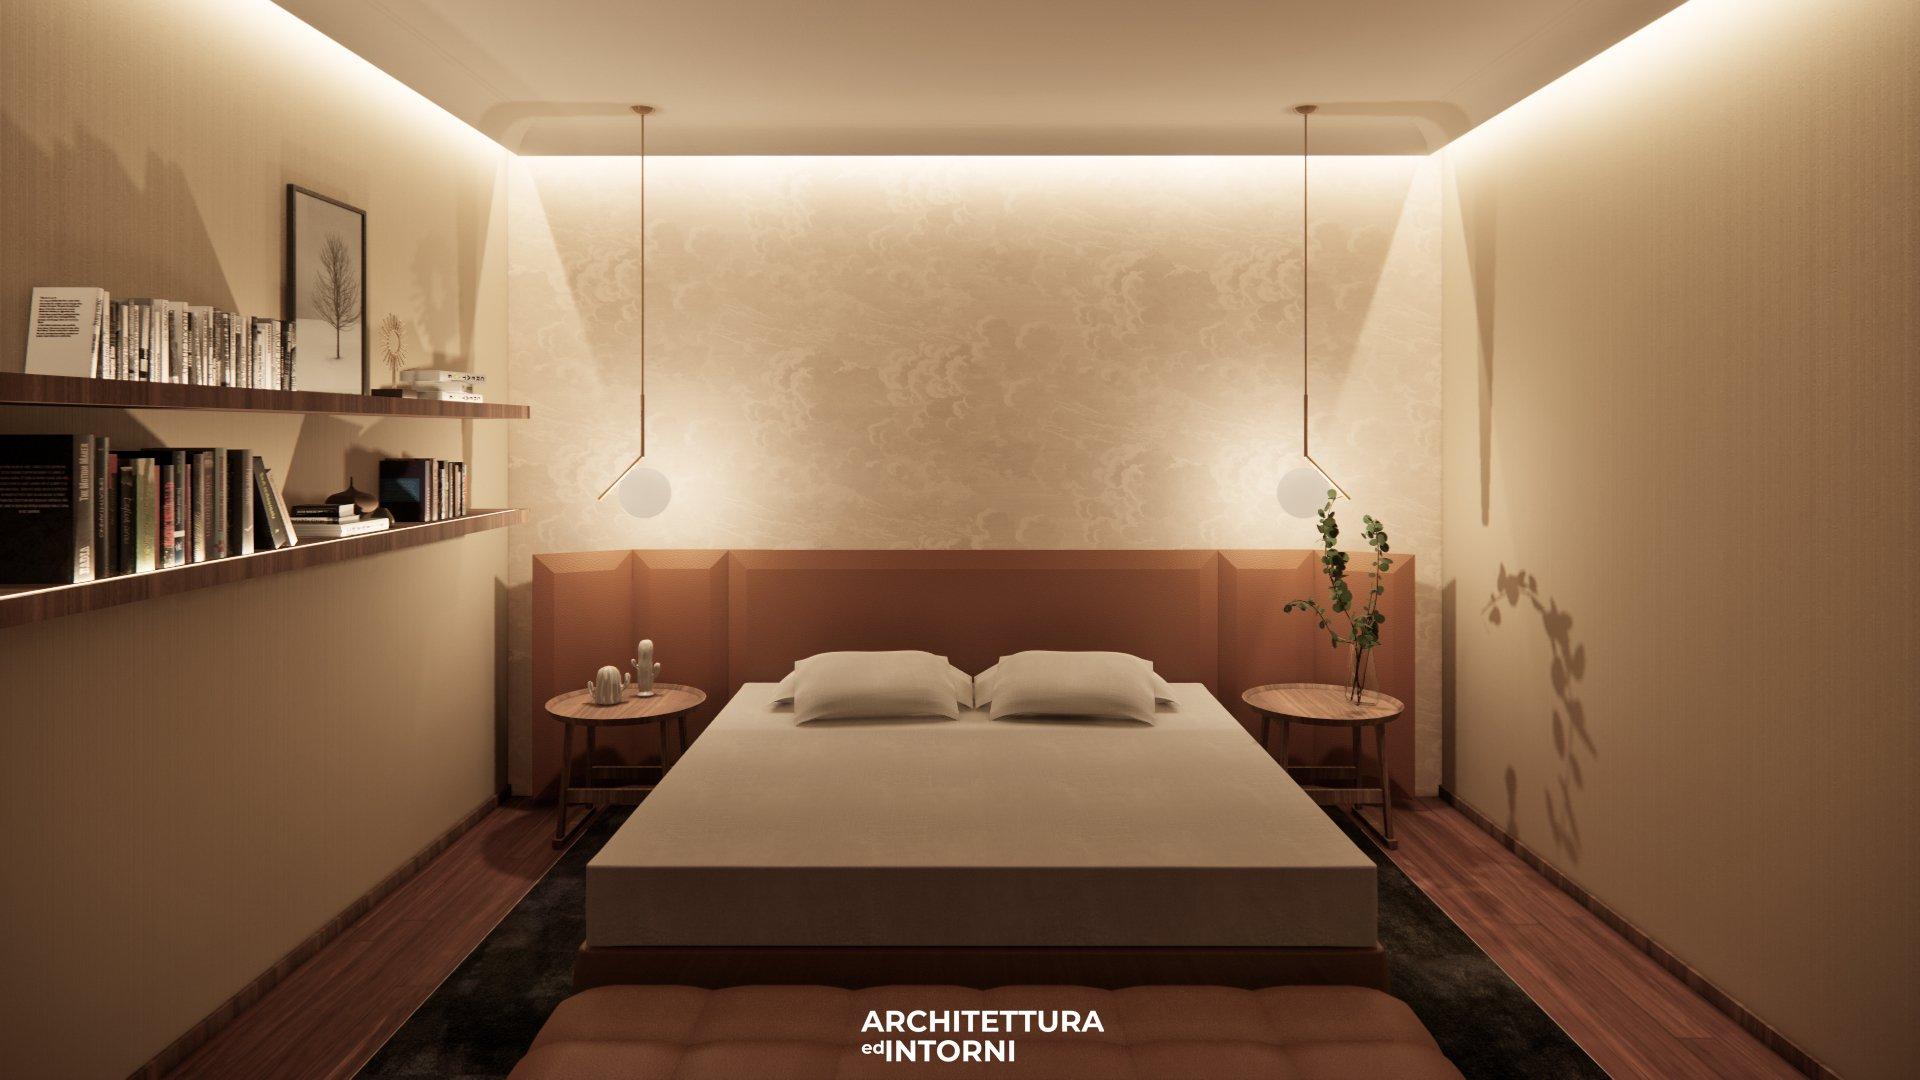 Interior Design - ARCHITETTURA ed INTORNI